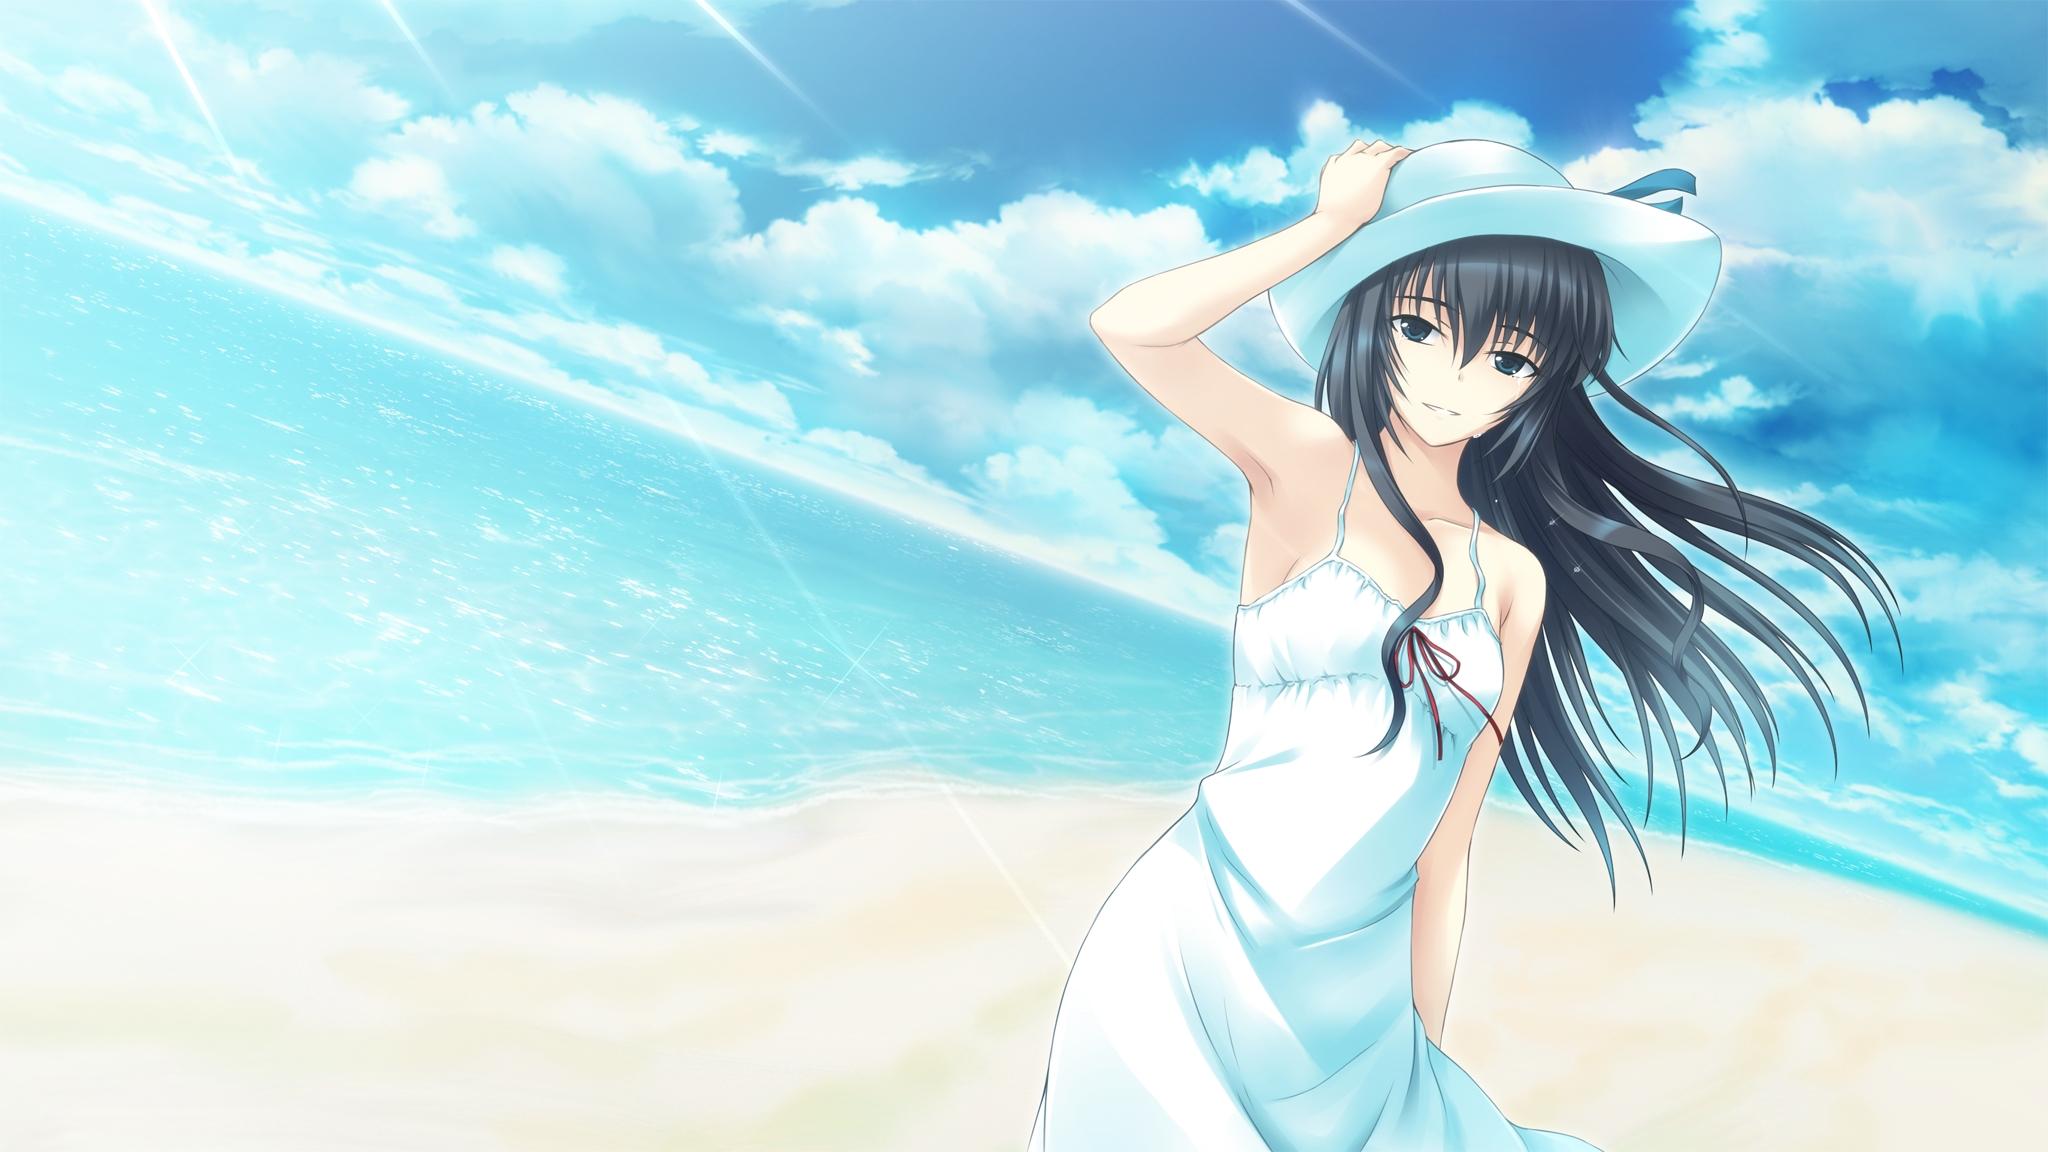 Tokyo babel hd wallpaper background image 2048x1152 - Beach anime girl ...